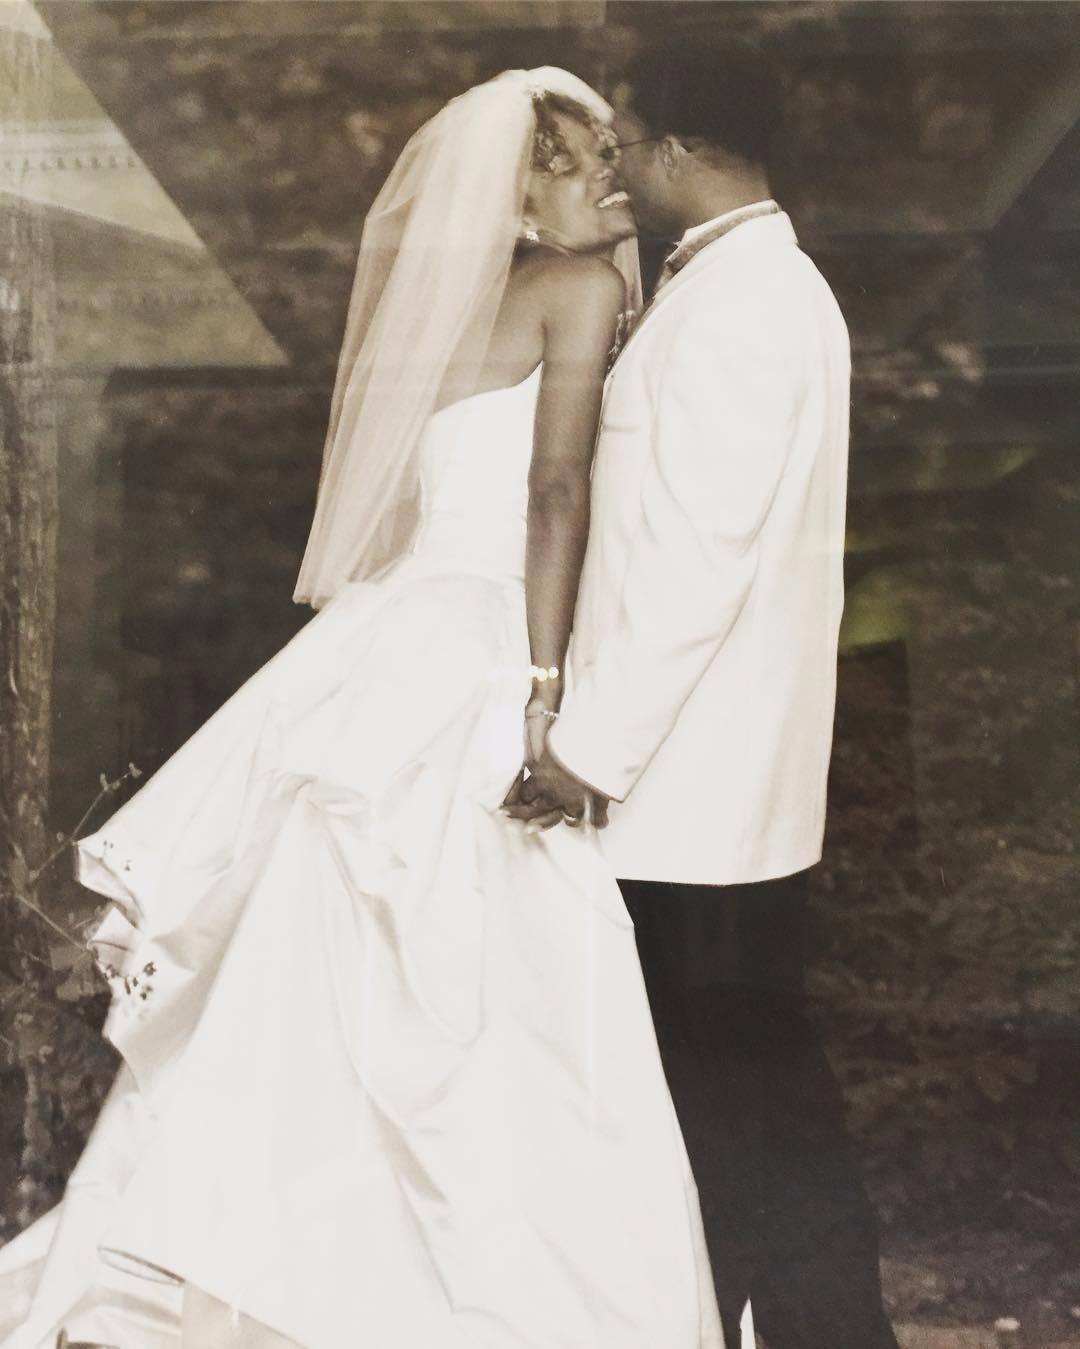 Sunny Hostin and Emmanuel Hostin on their wedding day.